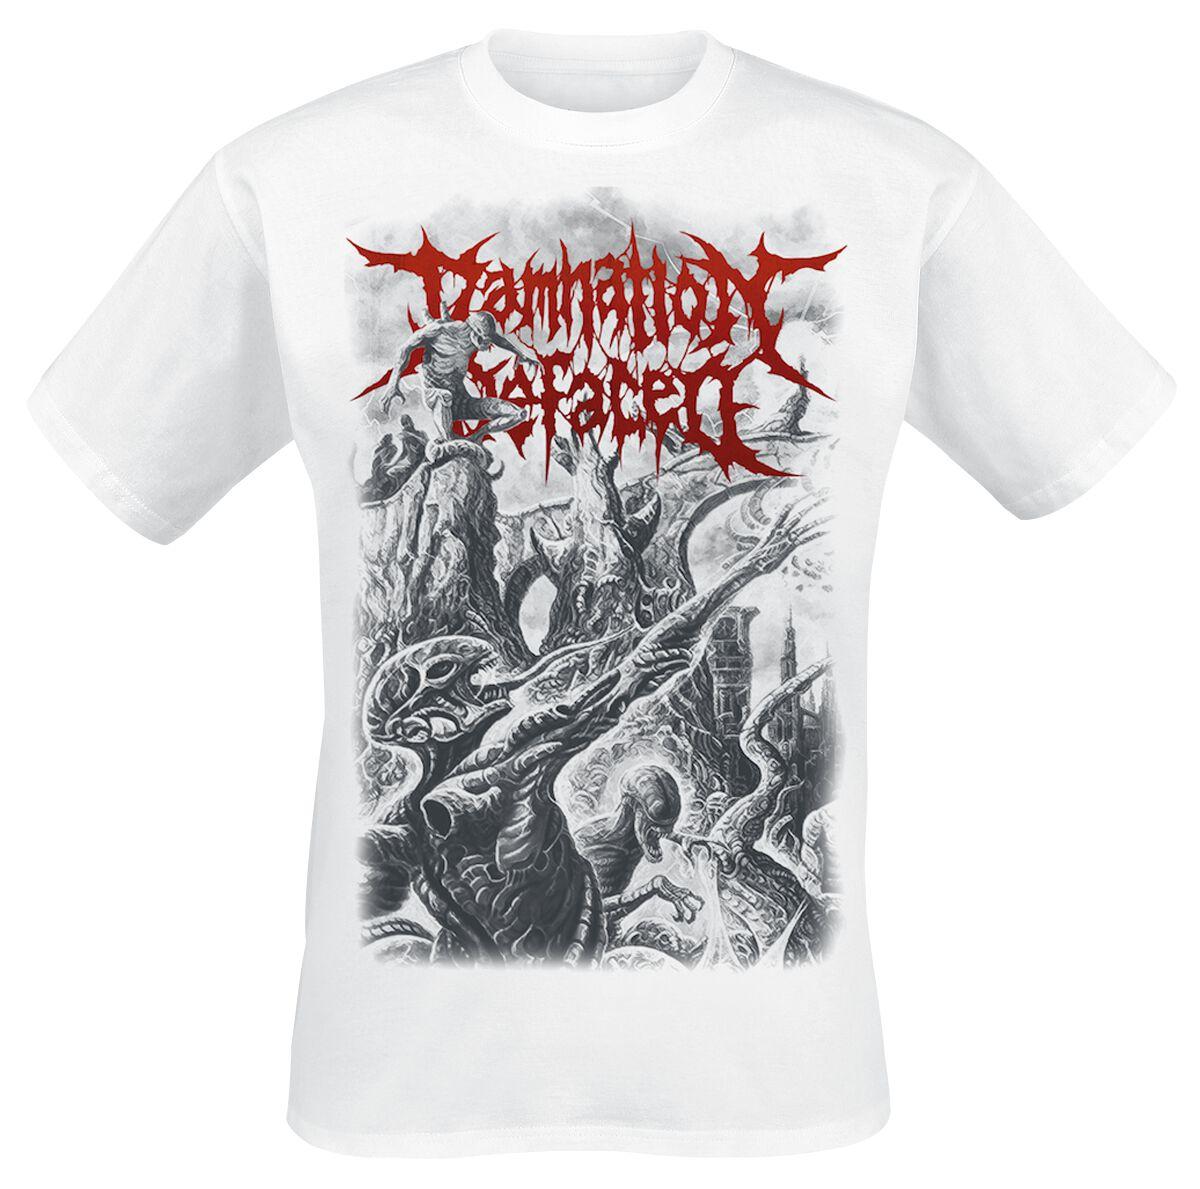 Zespoły - Koszulki - T-Shirt Damnation Defaced Invader from beyond T-Shirt biały - 365636